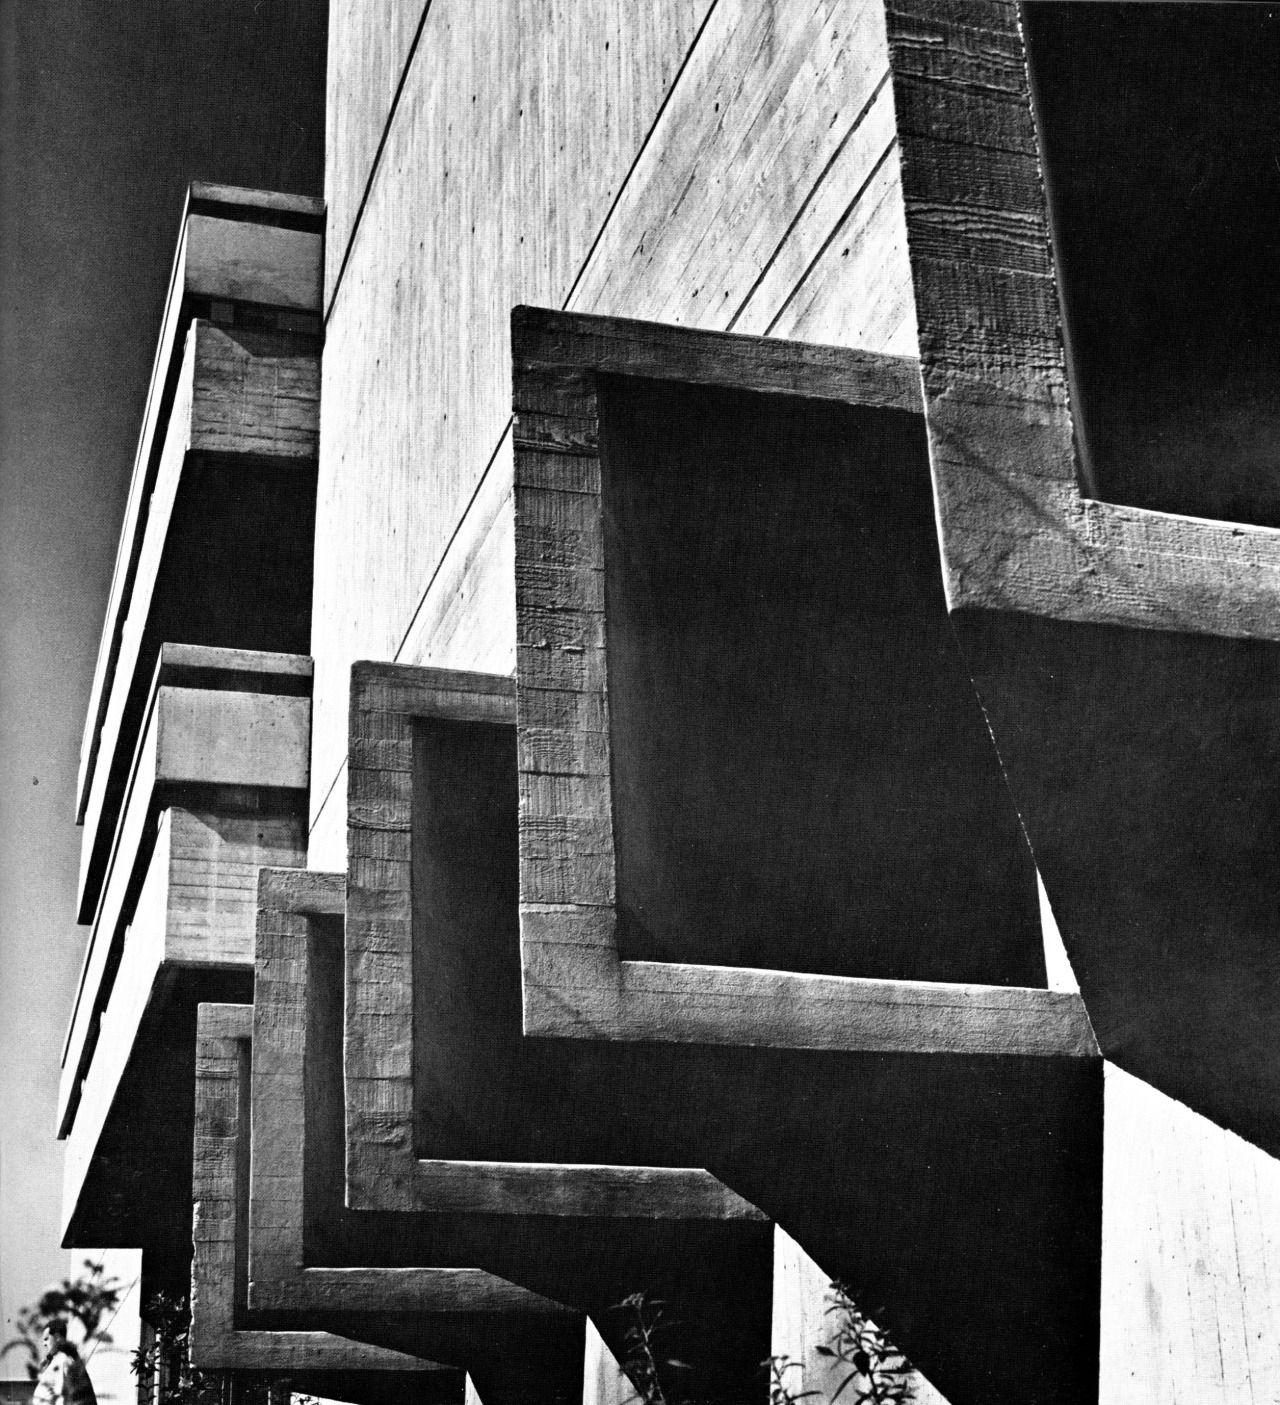 Engineering precinct sydney university new south wales 1960s · concrete architecturemodern